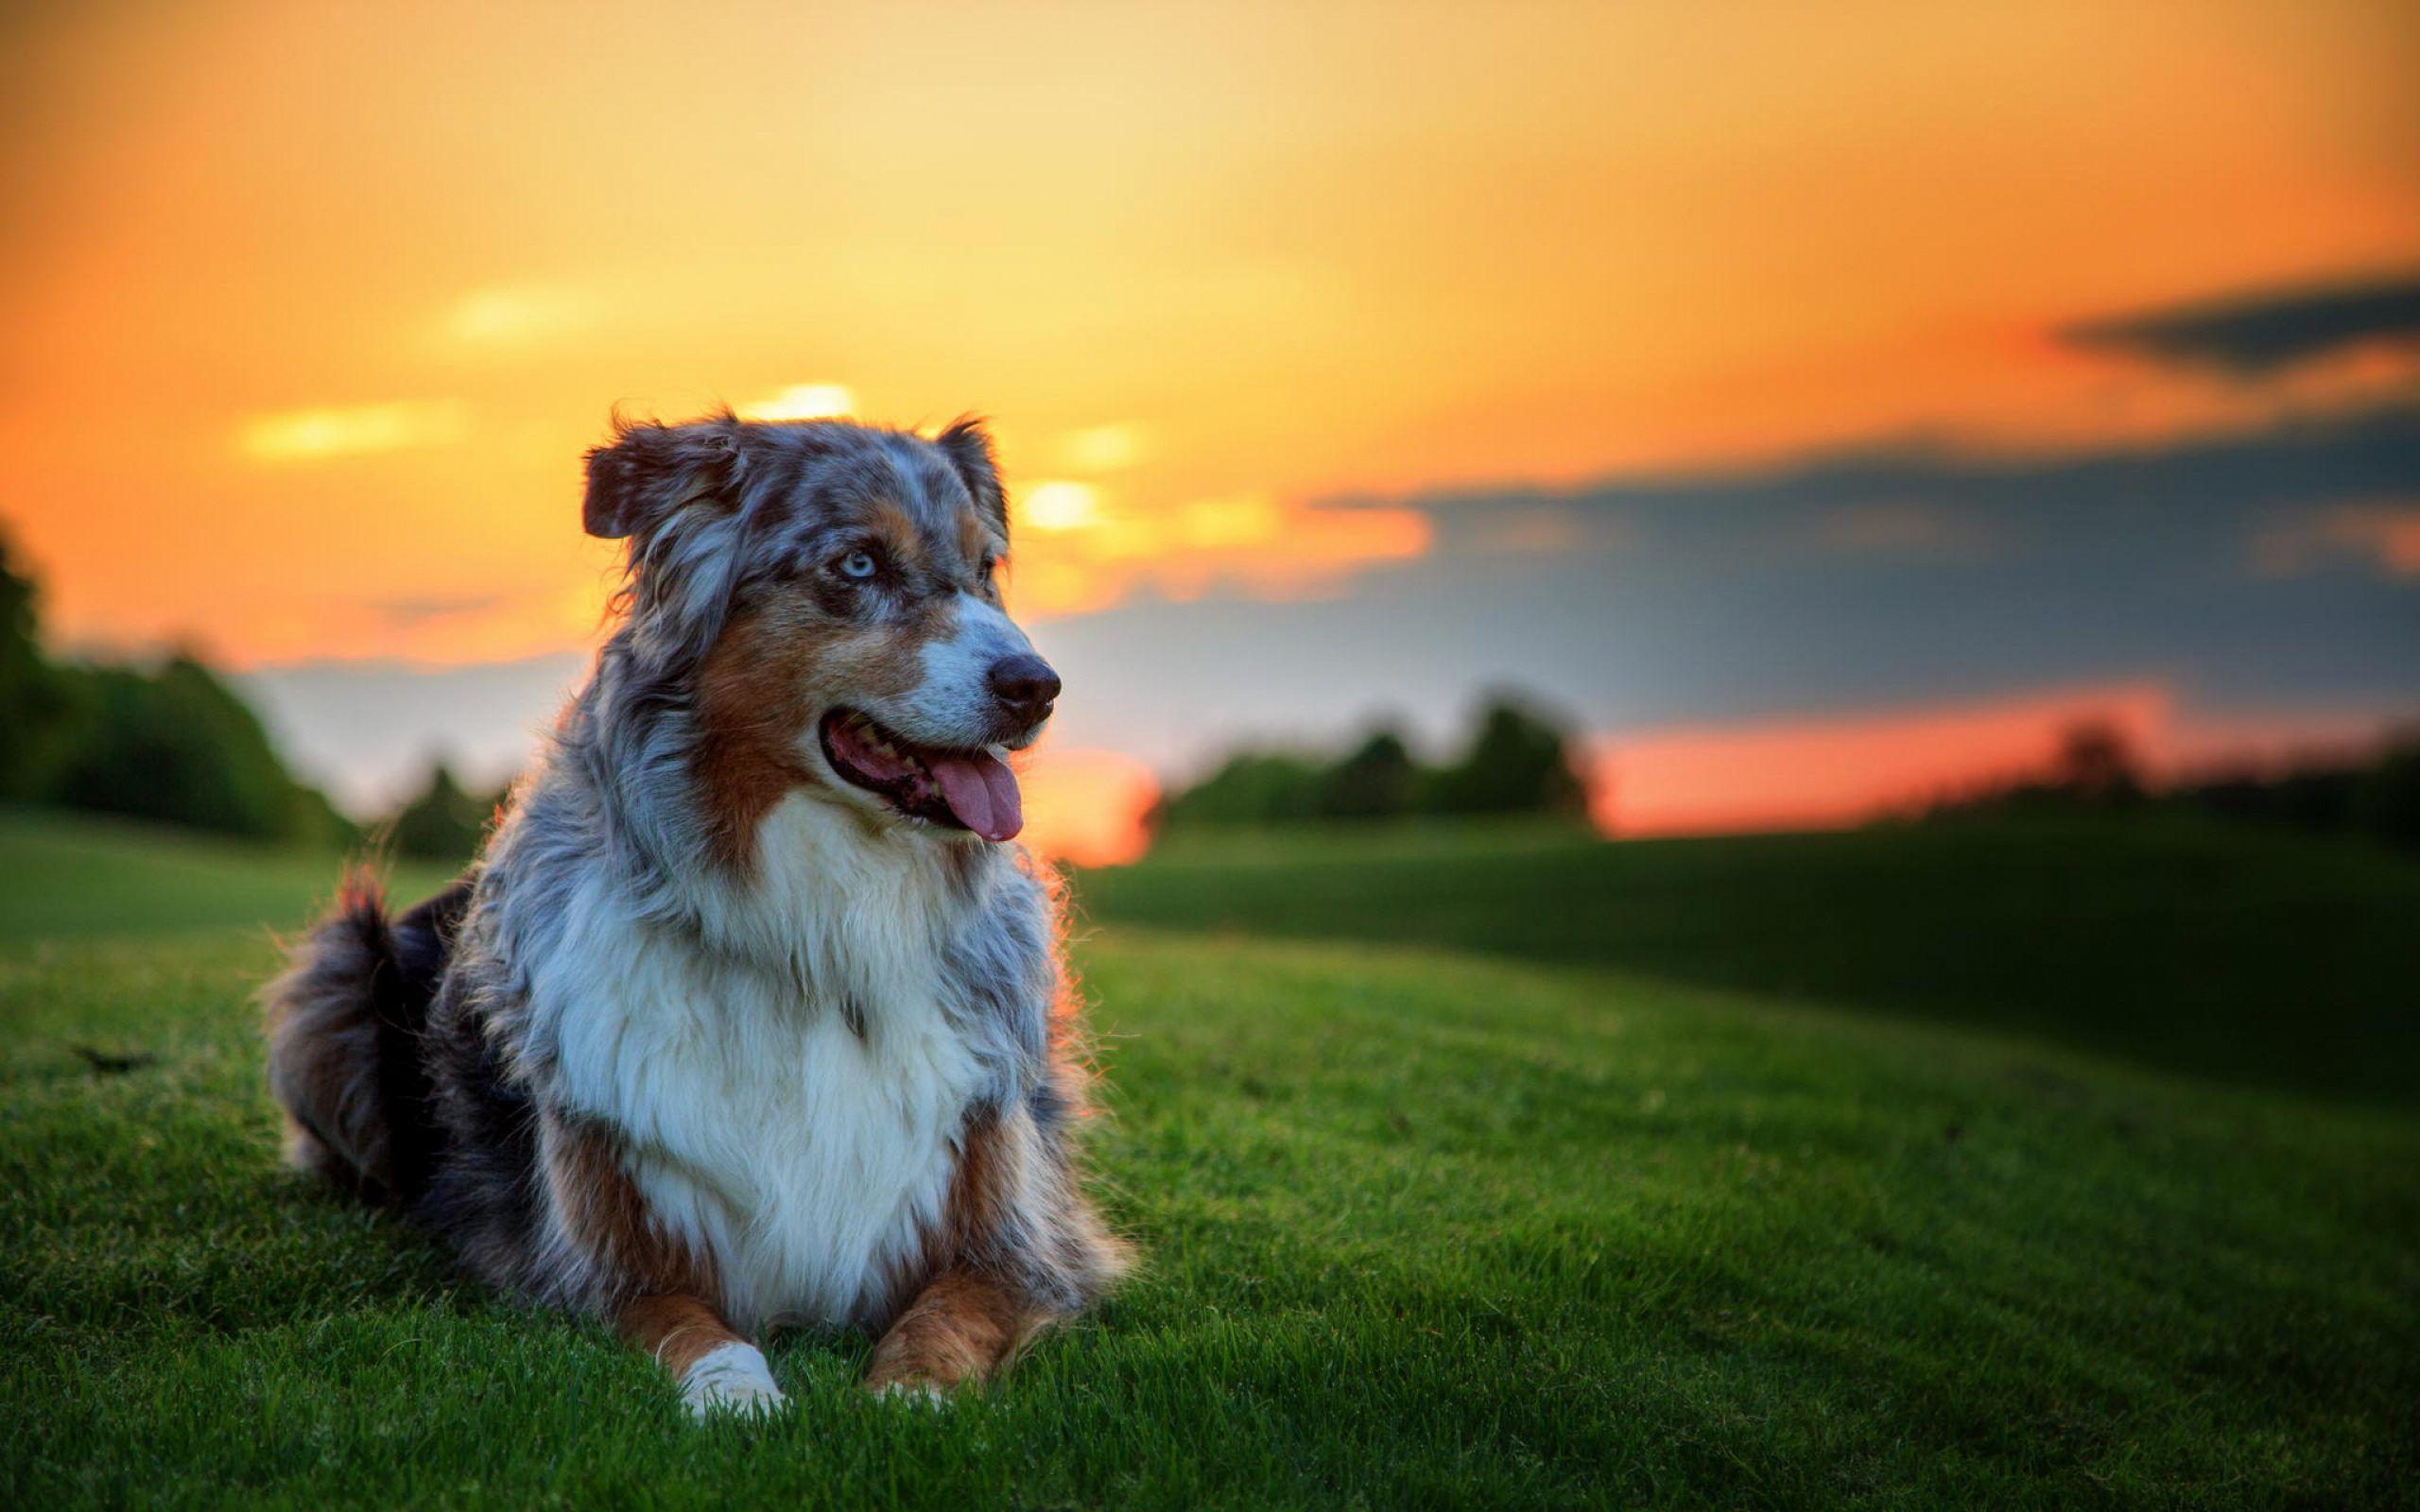 3c734c81d99f86c46756ceb0b4d6a08c 40 wallpapers and pictures of dogs nice dogs pinterest